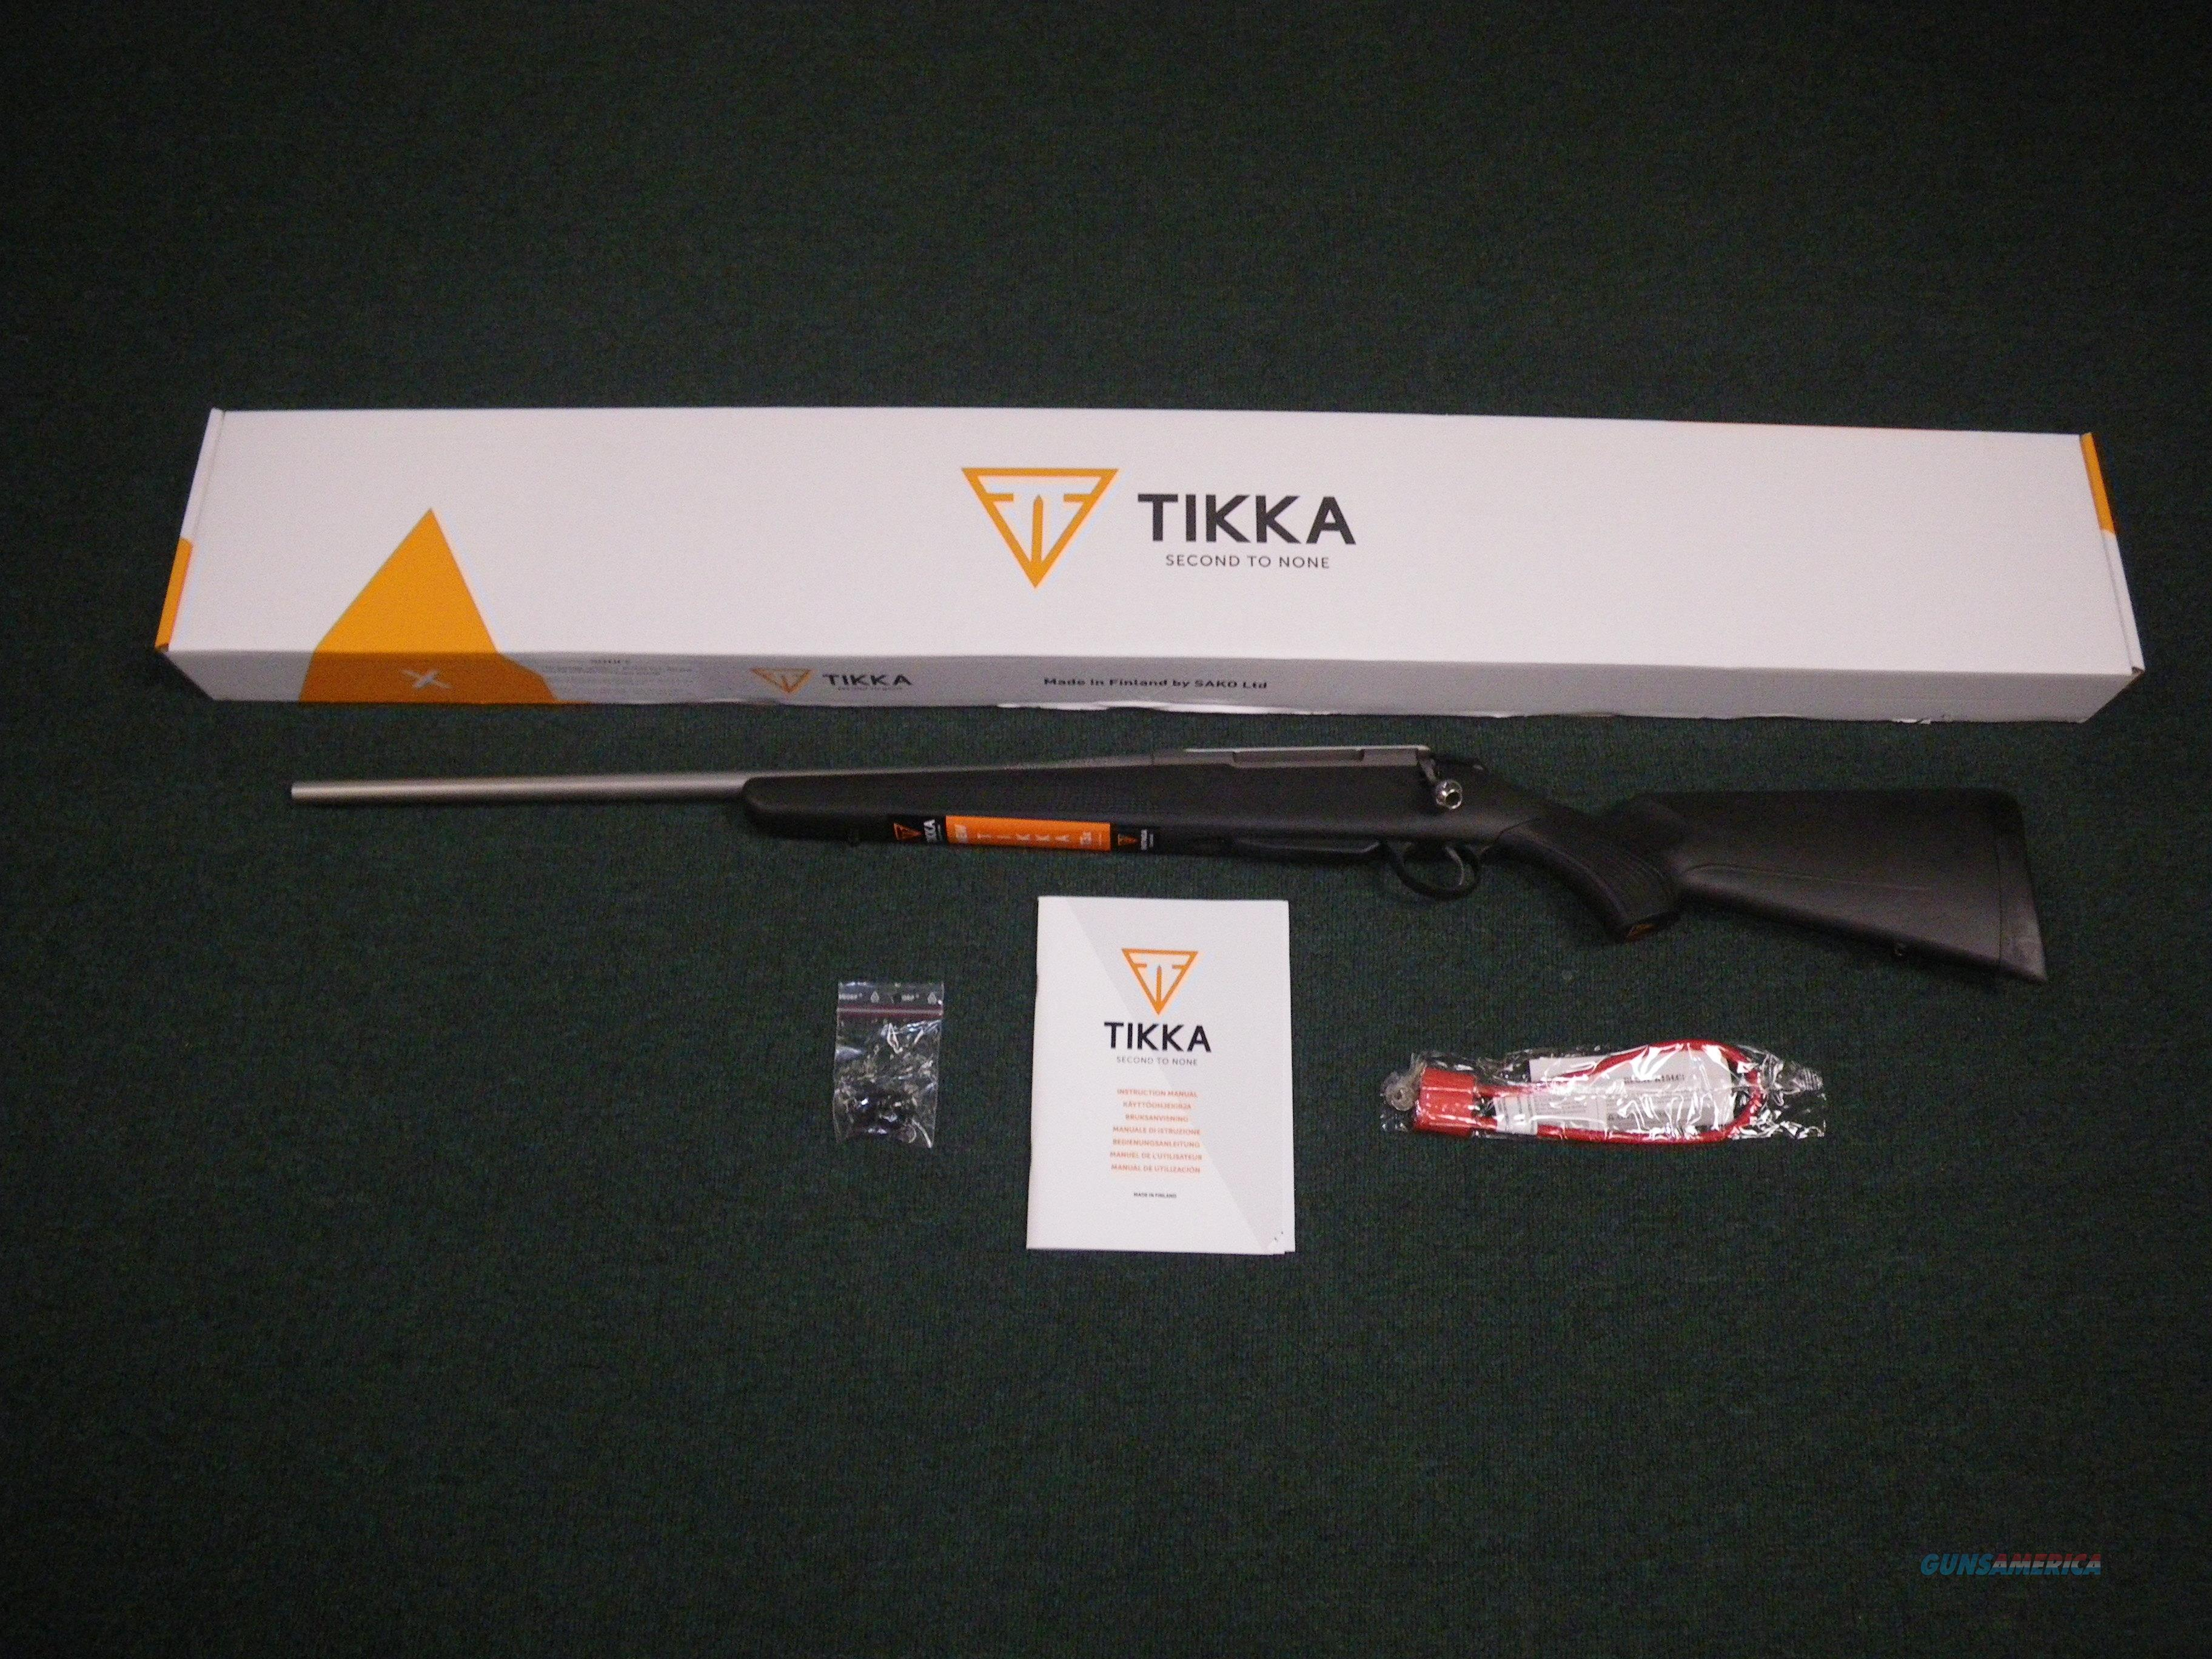 "Tikka T3x Lite LH Stainless/Synthetic 7mm Rem Mag 24.3"" NEW #JRTXB470  Guns > Rifles > Tikka Rifles > T3"